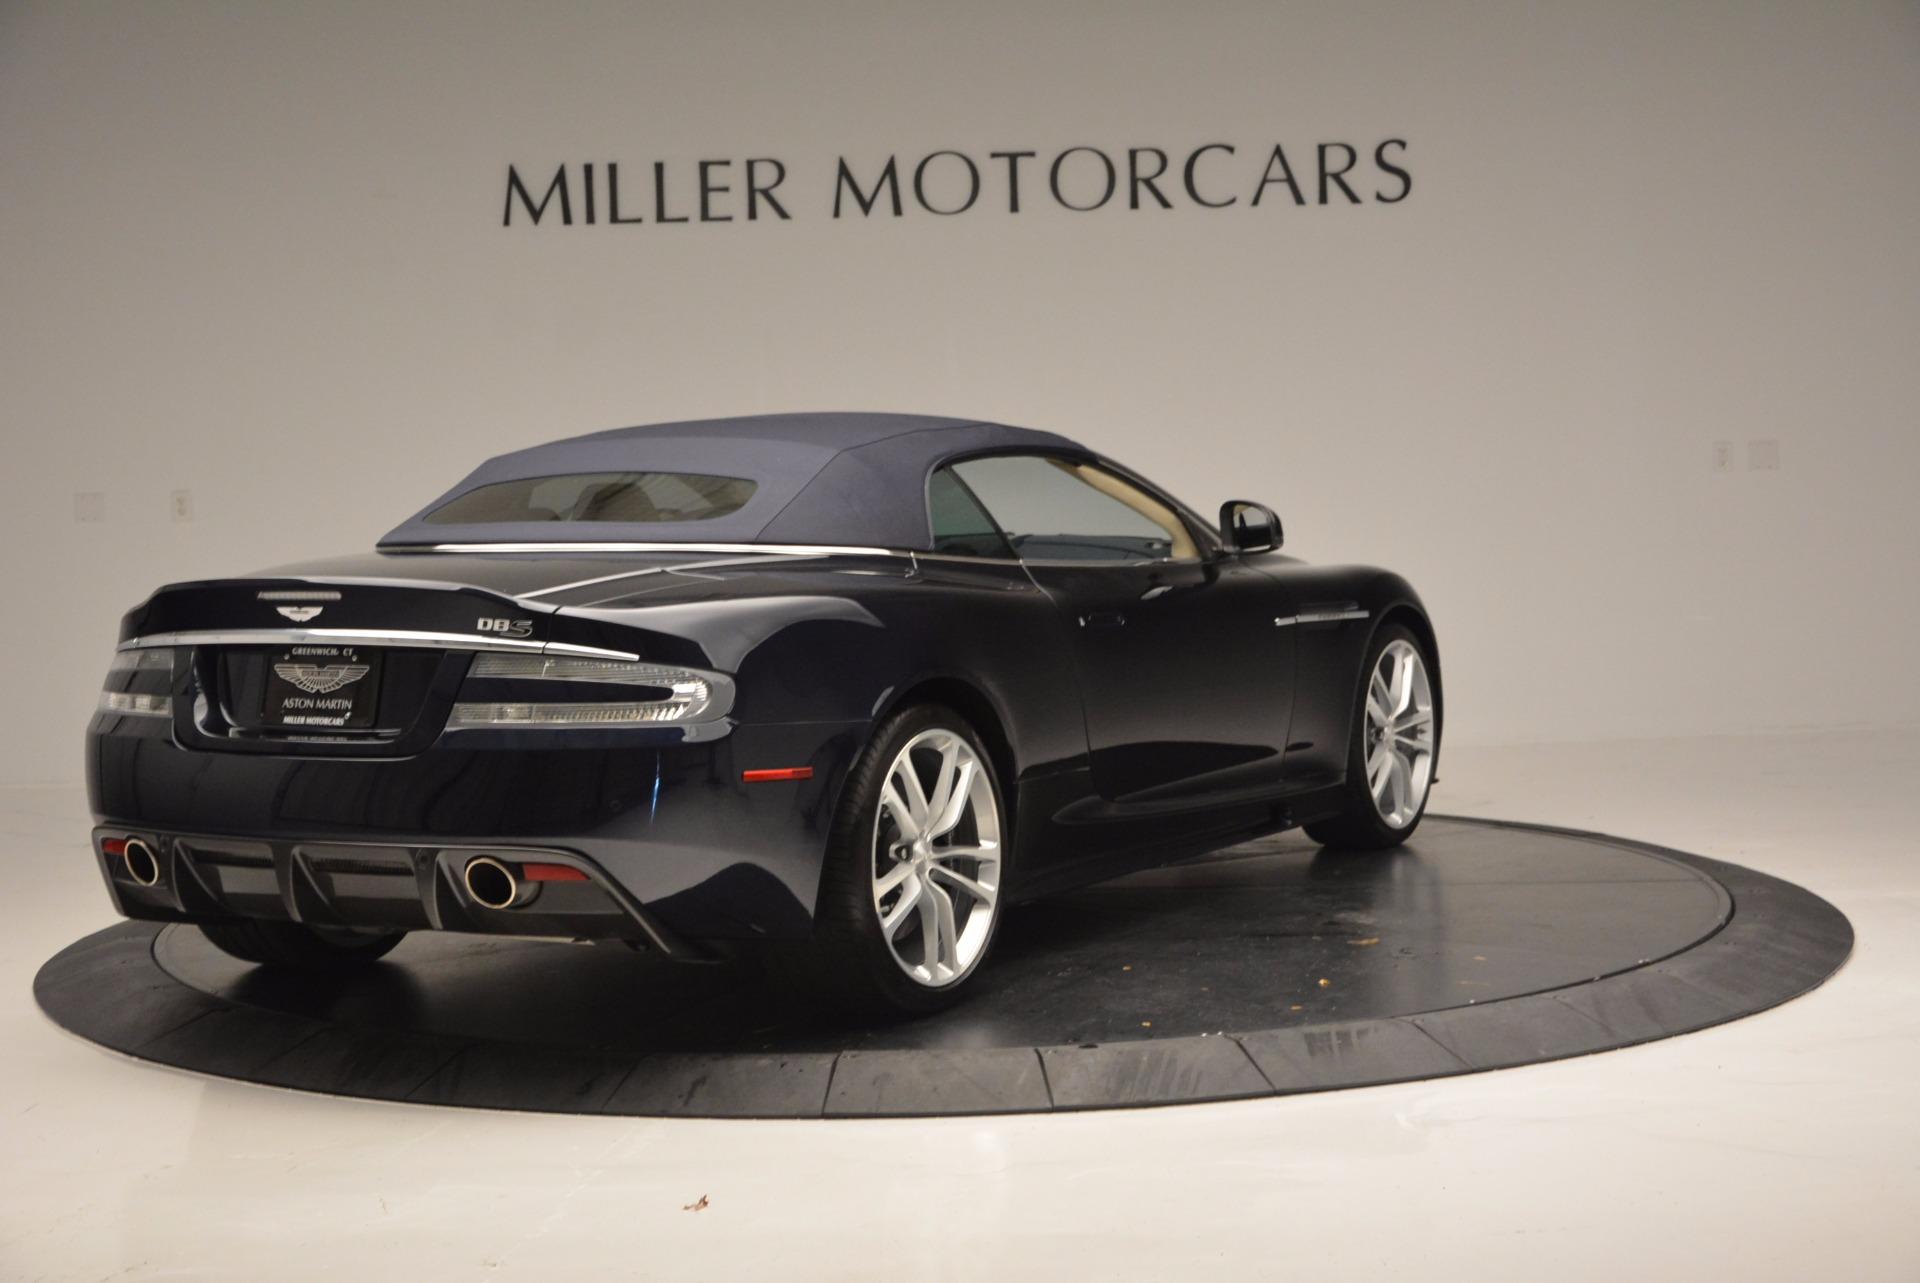 Used 2012 Aston Martin DBS Volante For Sale In Greenwich, CT 644_p19